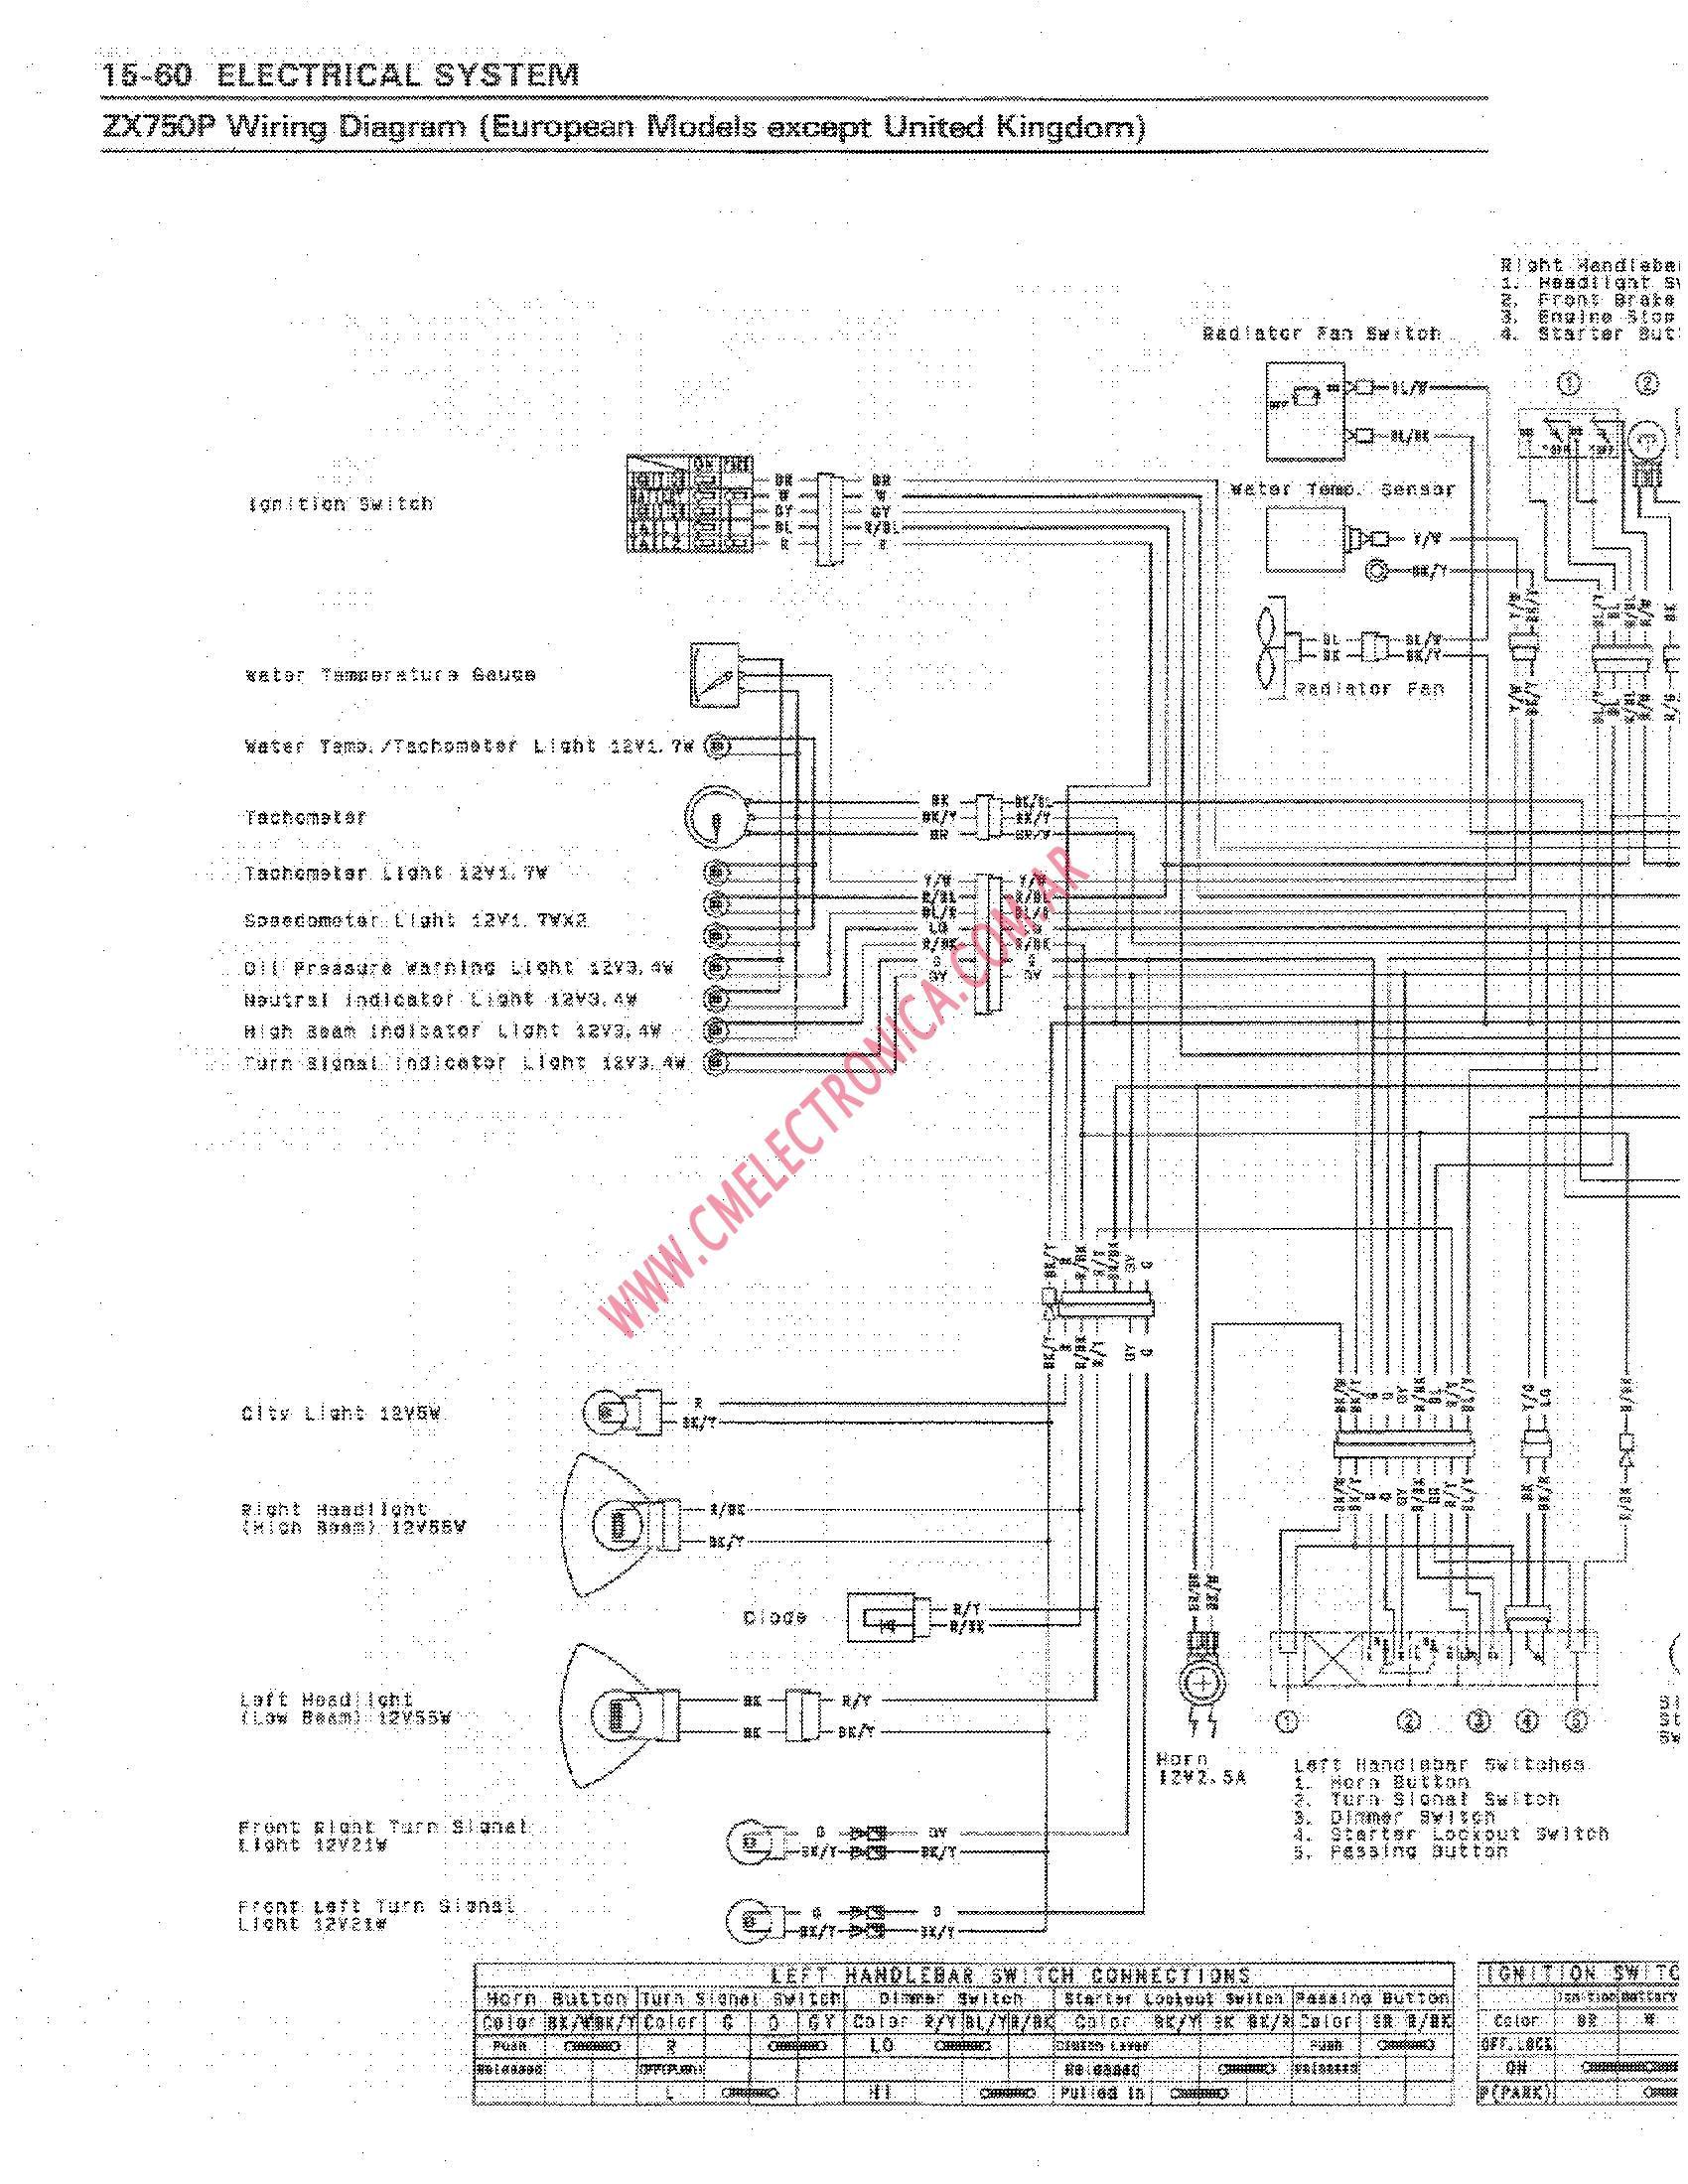 kawasaki zx7 wiring diagram schema diagram databasekawasaki zx7 wiring diagram use wiring diagram kawasaki ninja zx7r